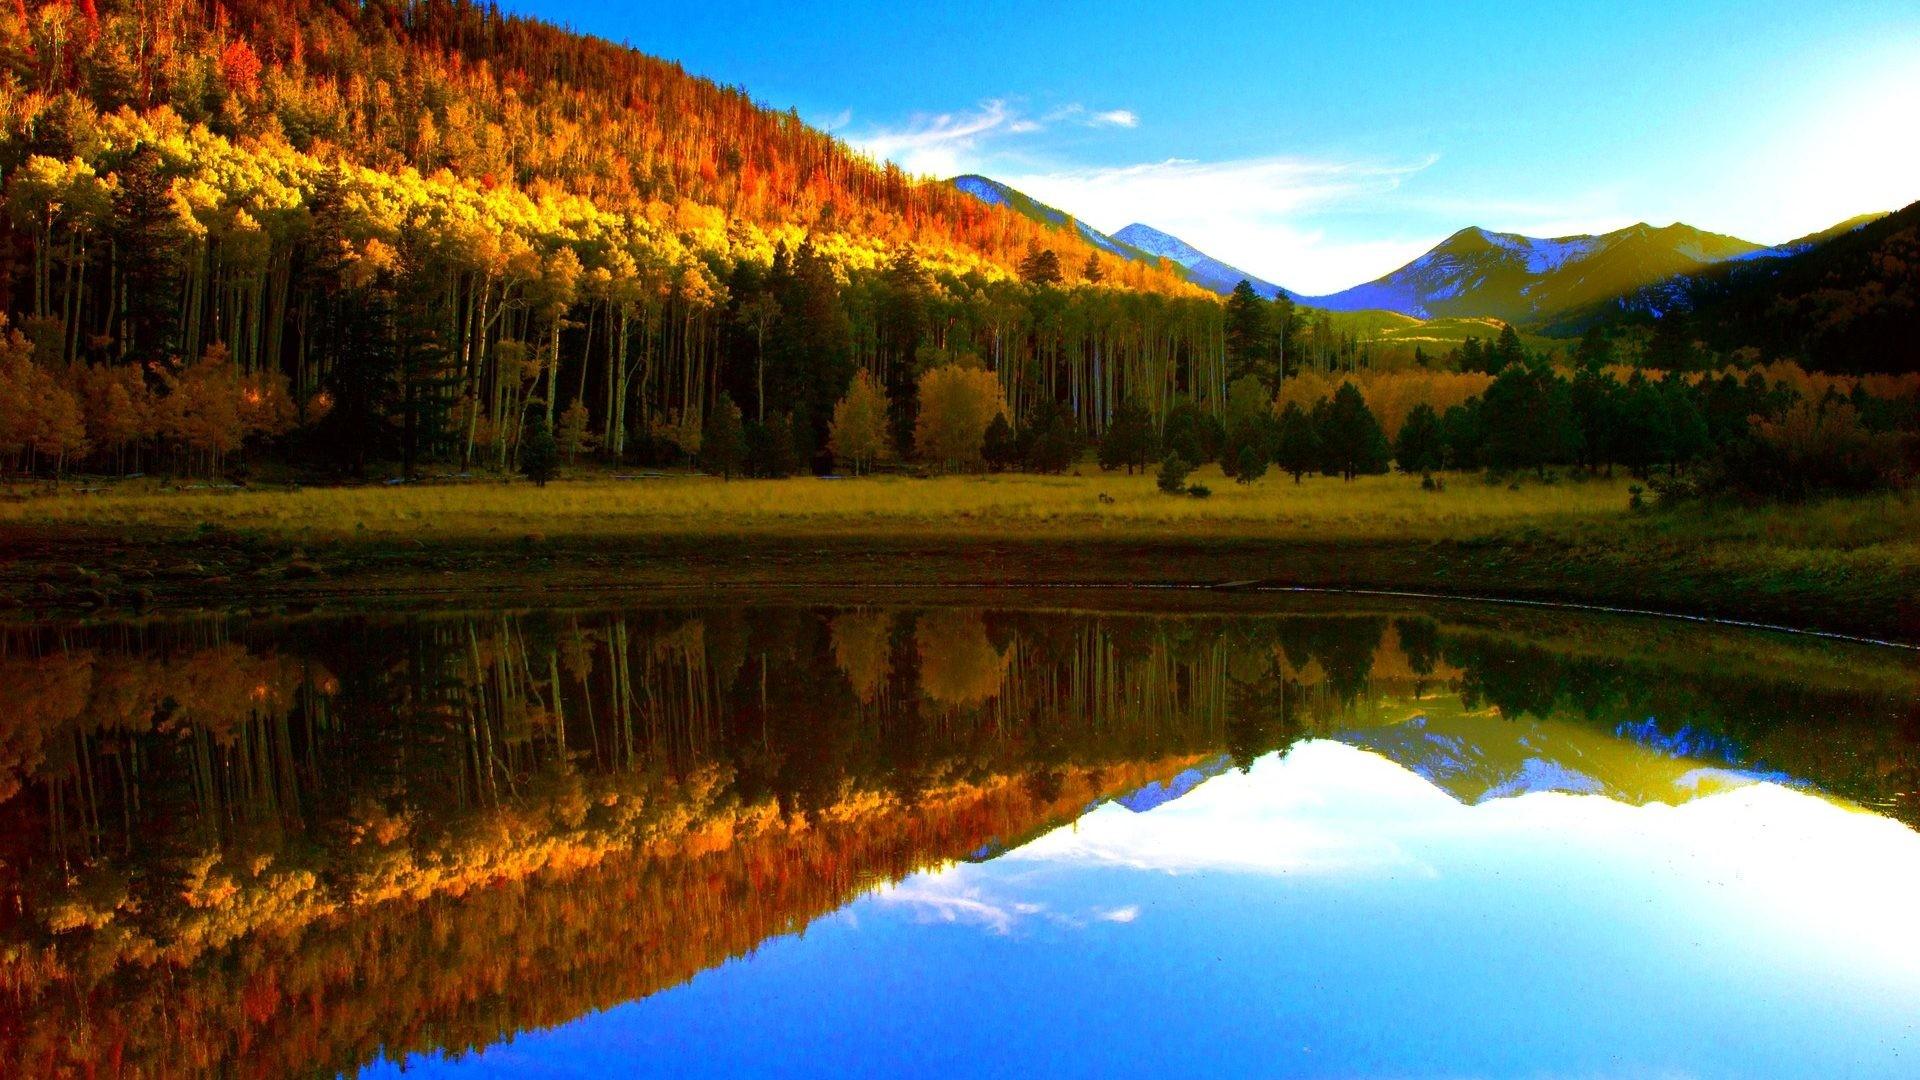 Lakes – Light Autumn Reflection Fall Mountain Lake Tahoe Desktop Wallpaper  for HD 16:9